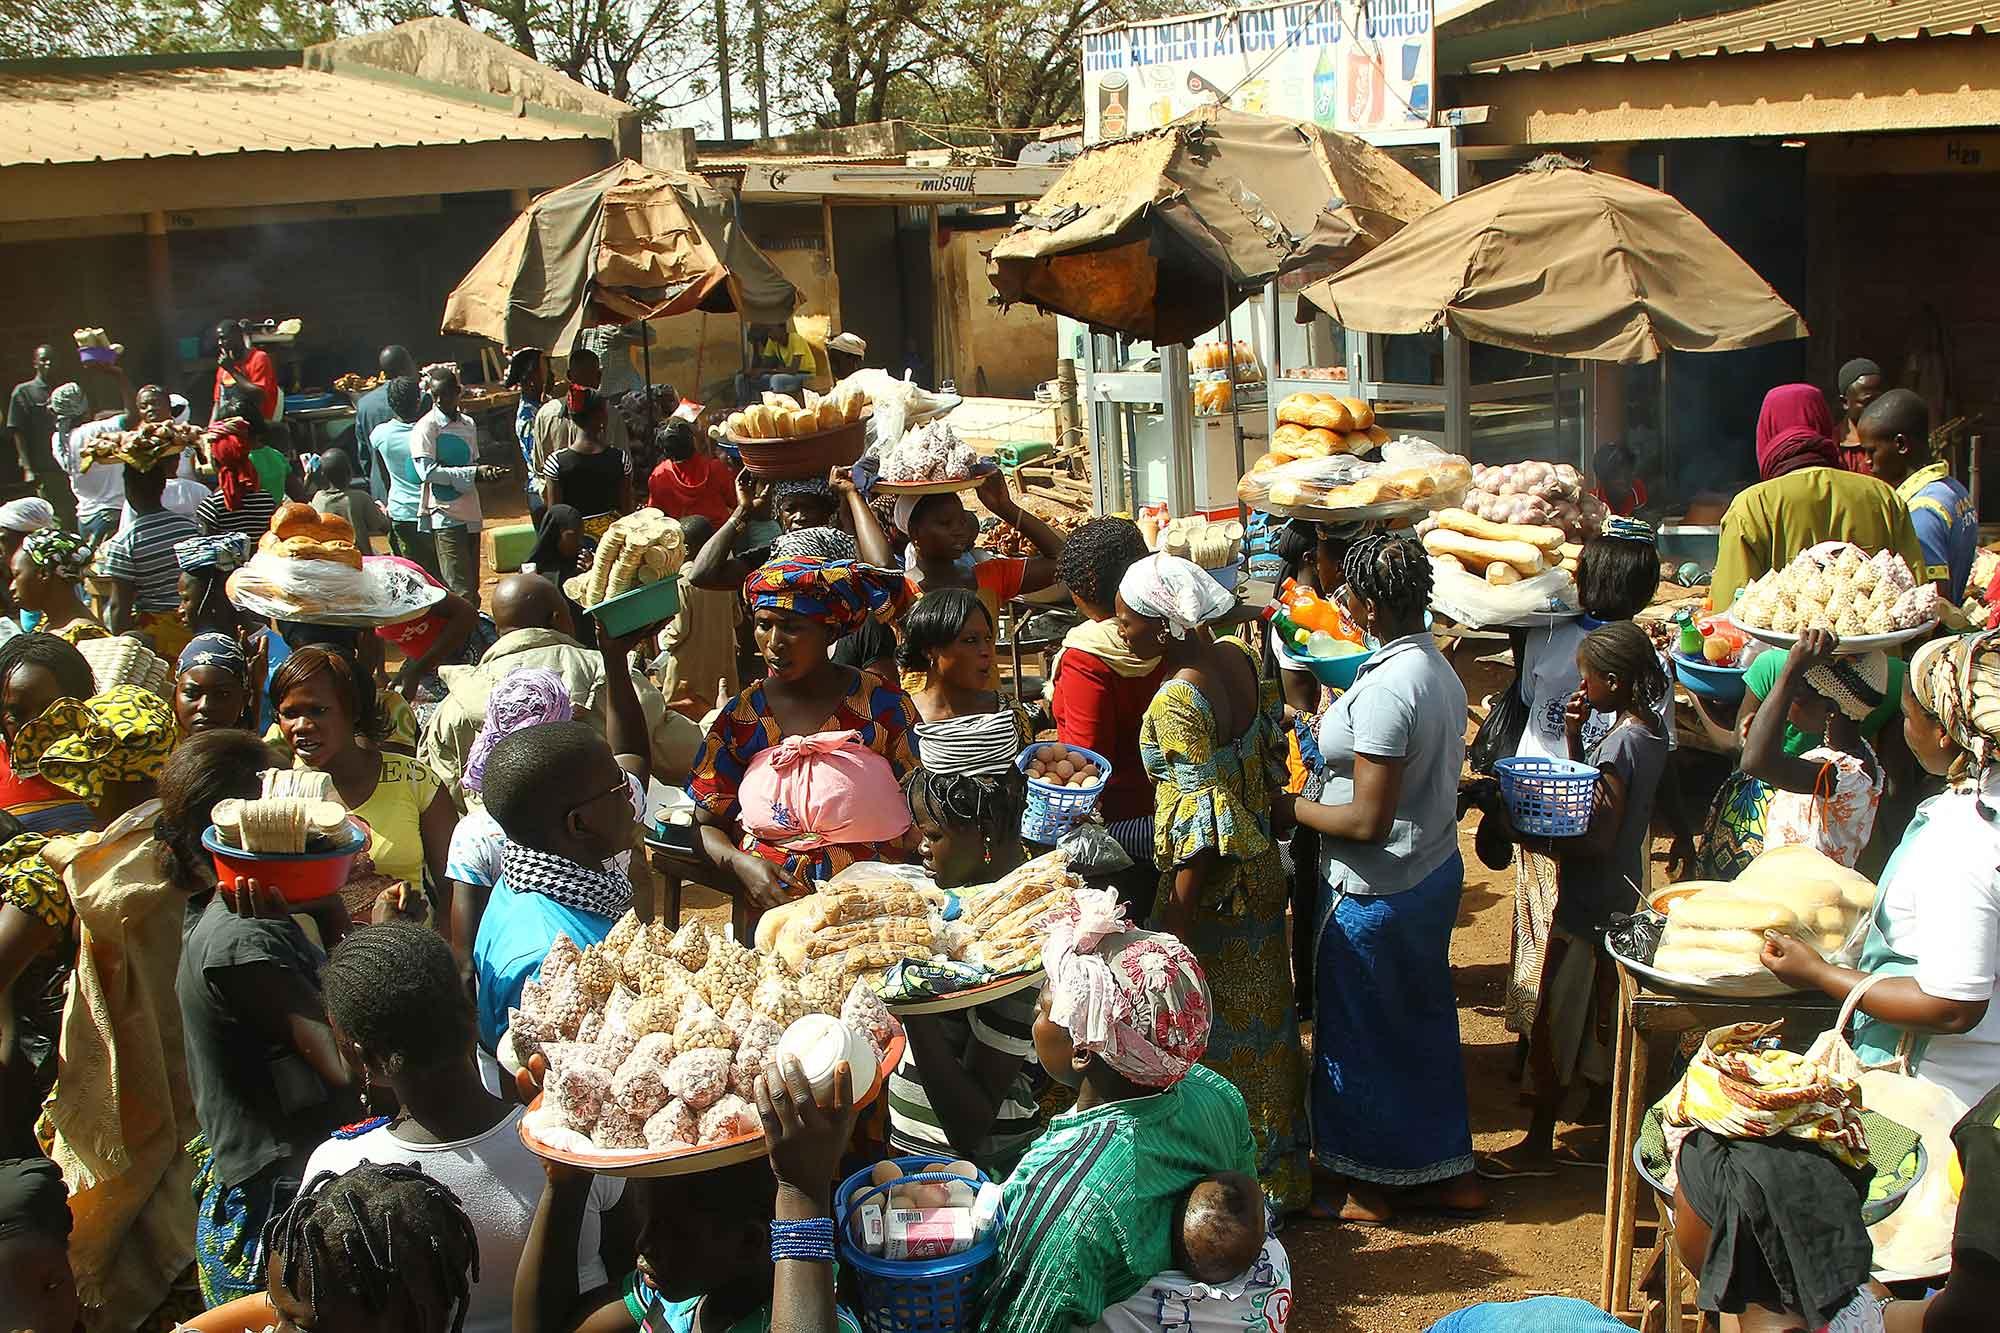 Market life in Bobo Dioulasso, Burkina Faso. © Ulli Maier & Nisa Maier